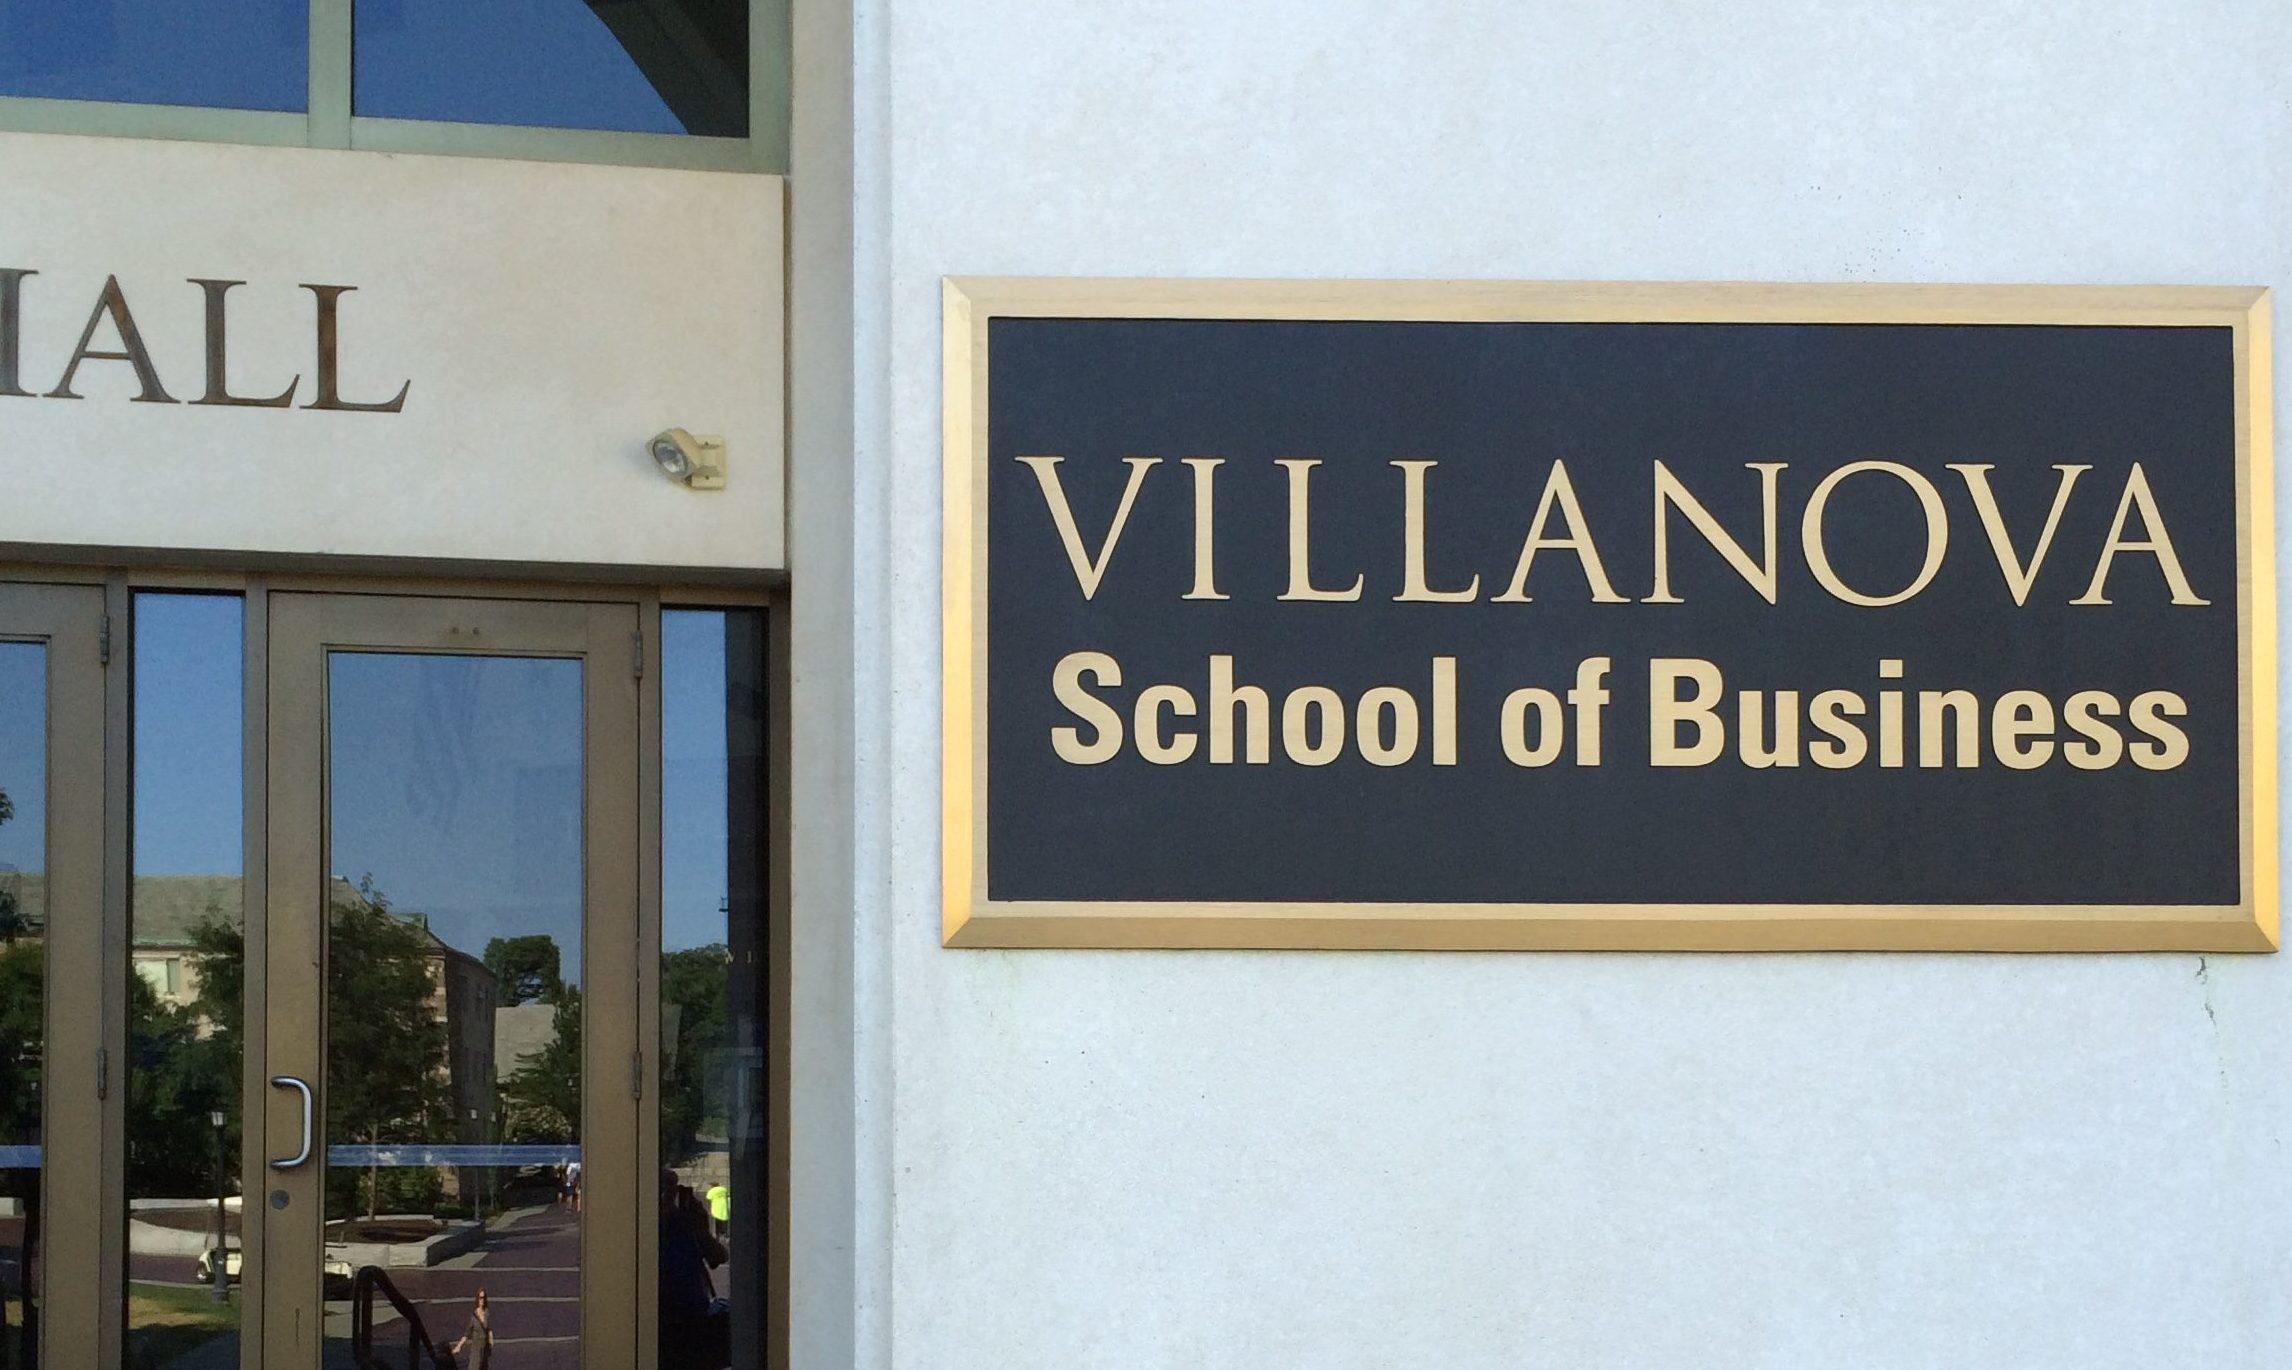 Plaque - Villanova School of Business